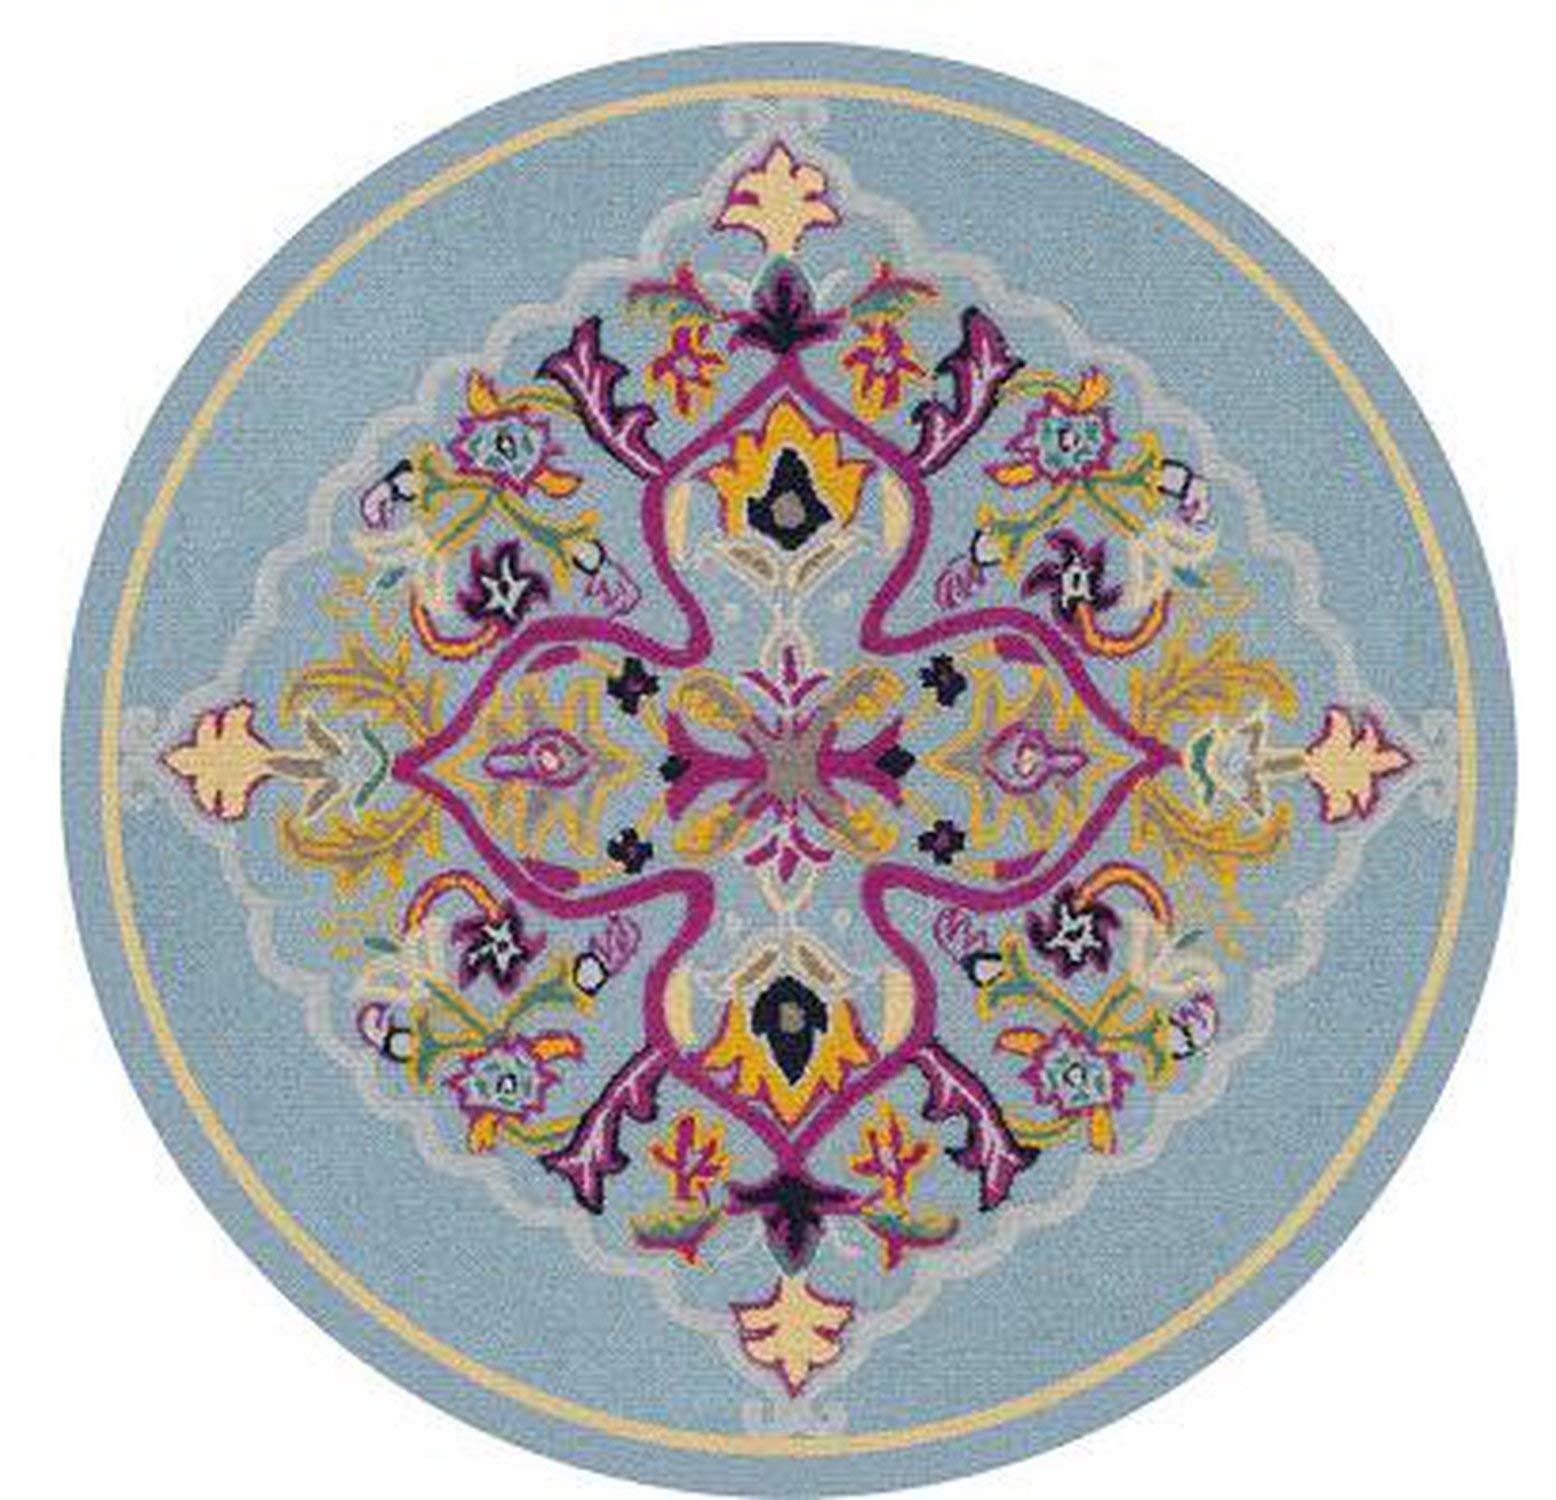 Nordic Retro Ethnic Jacquard Mandala Round Mat Flower Nordic Printed Round Carpet for Livingroom Kids Room Large Area Rug Ho,H,120x120cm by Ting room